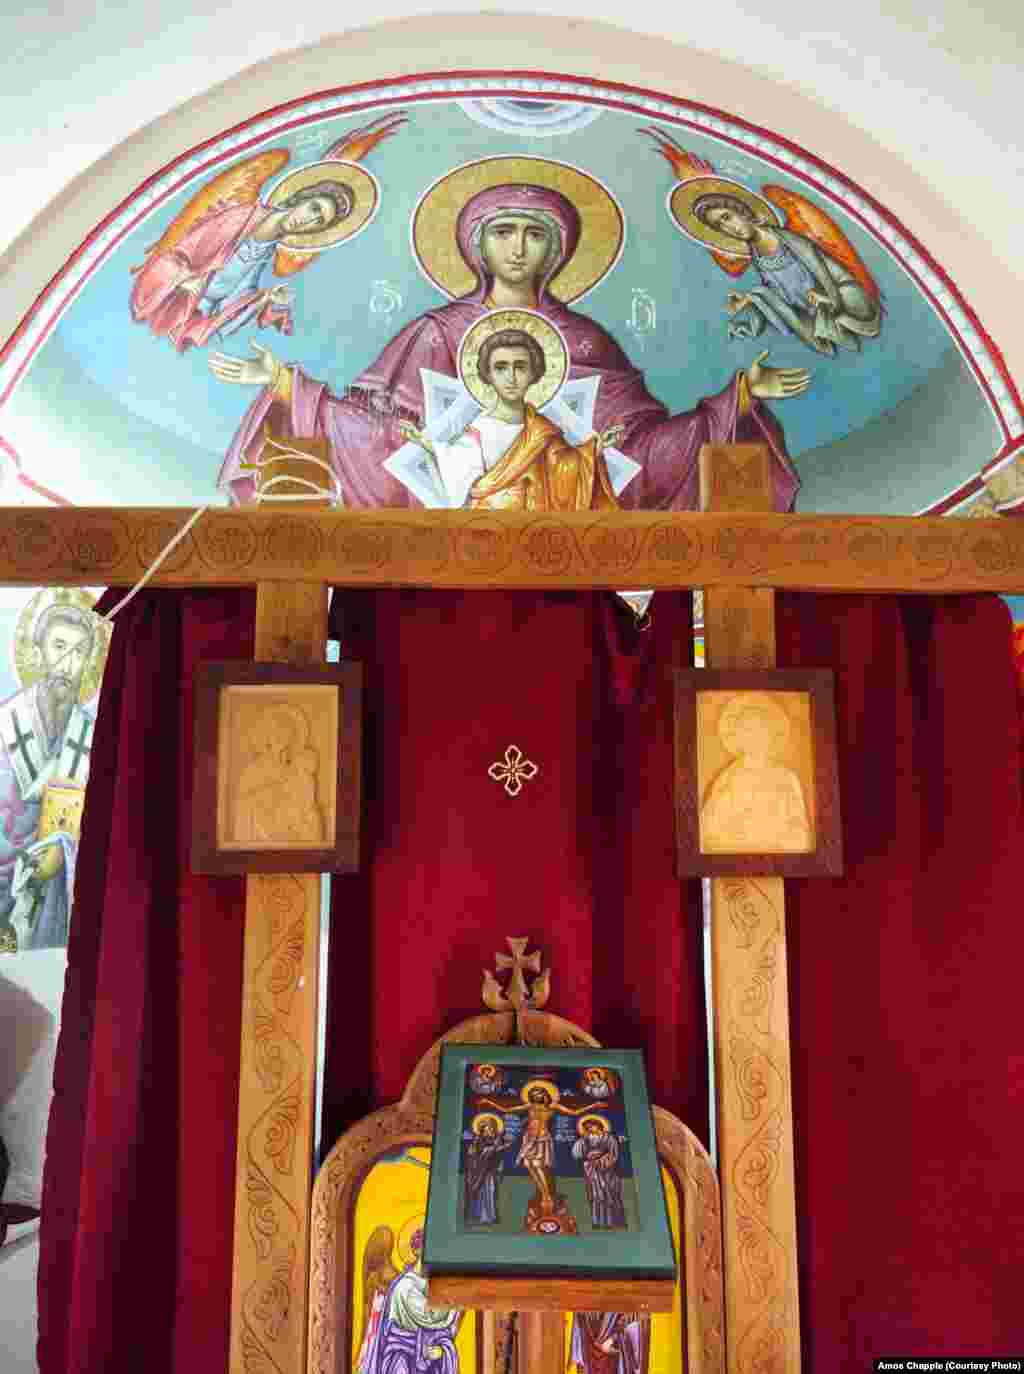 Interior of the chapel atop the pillar.